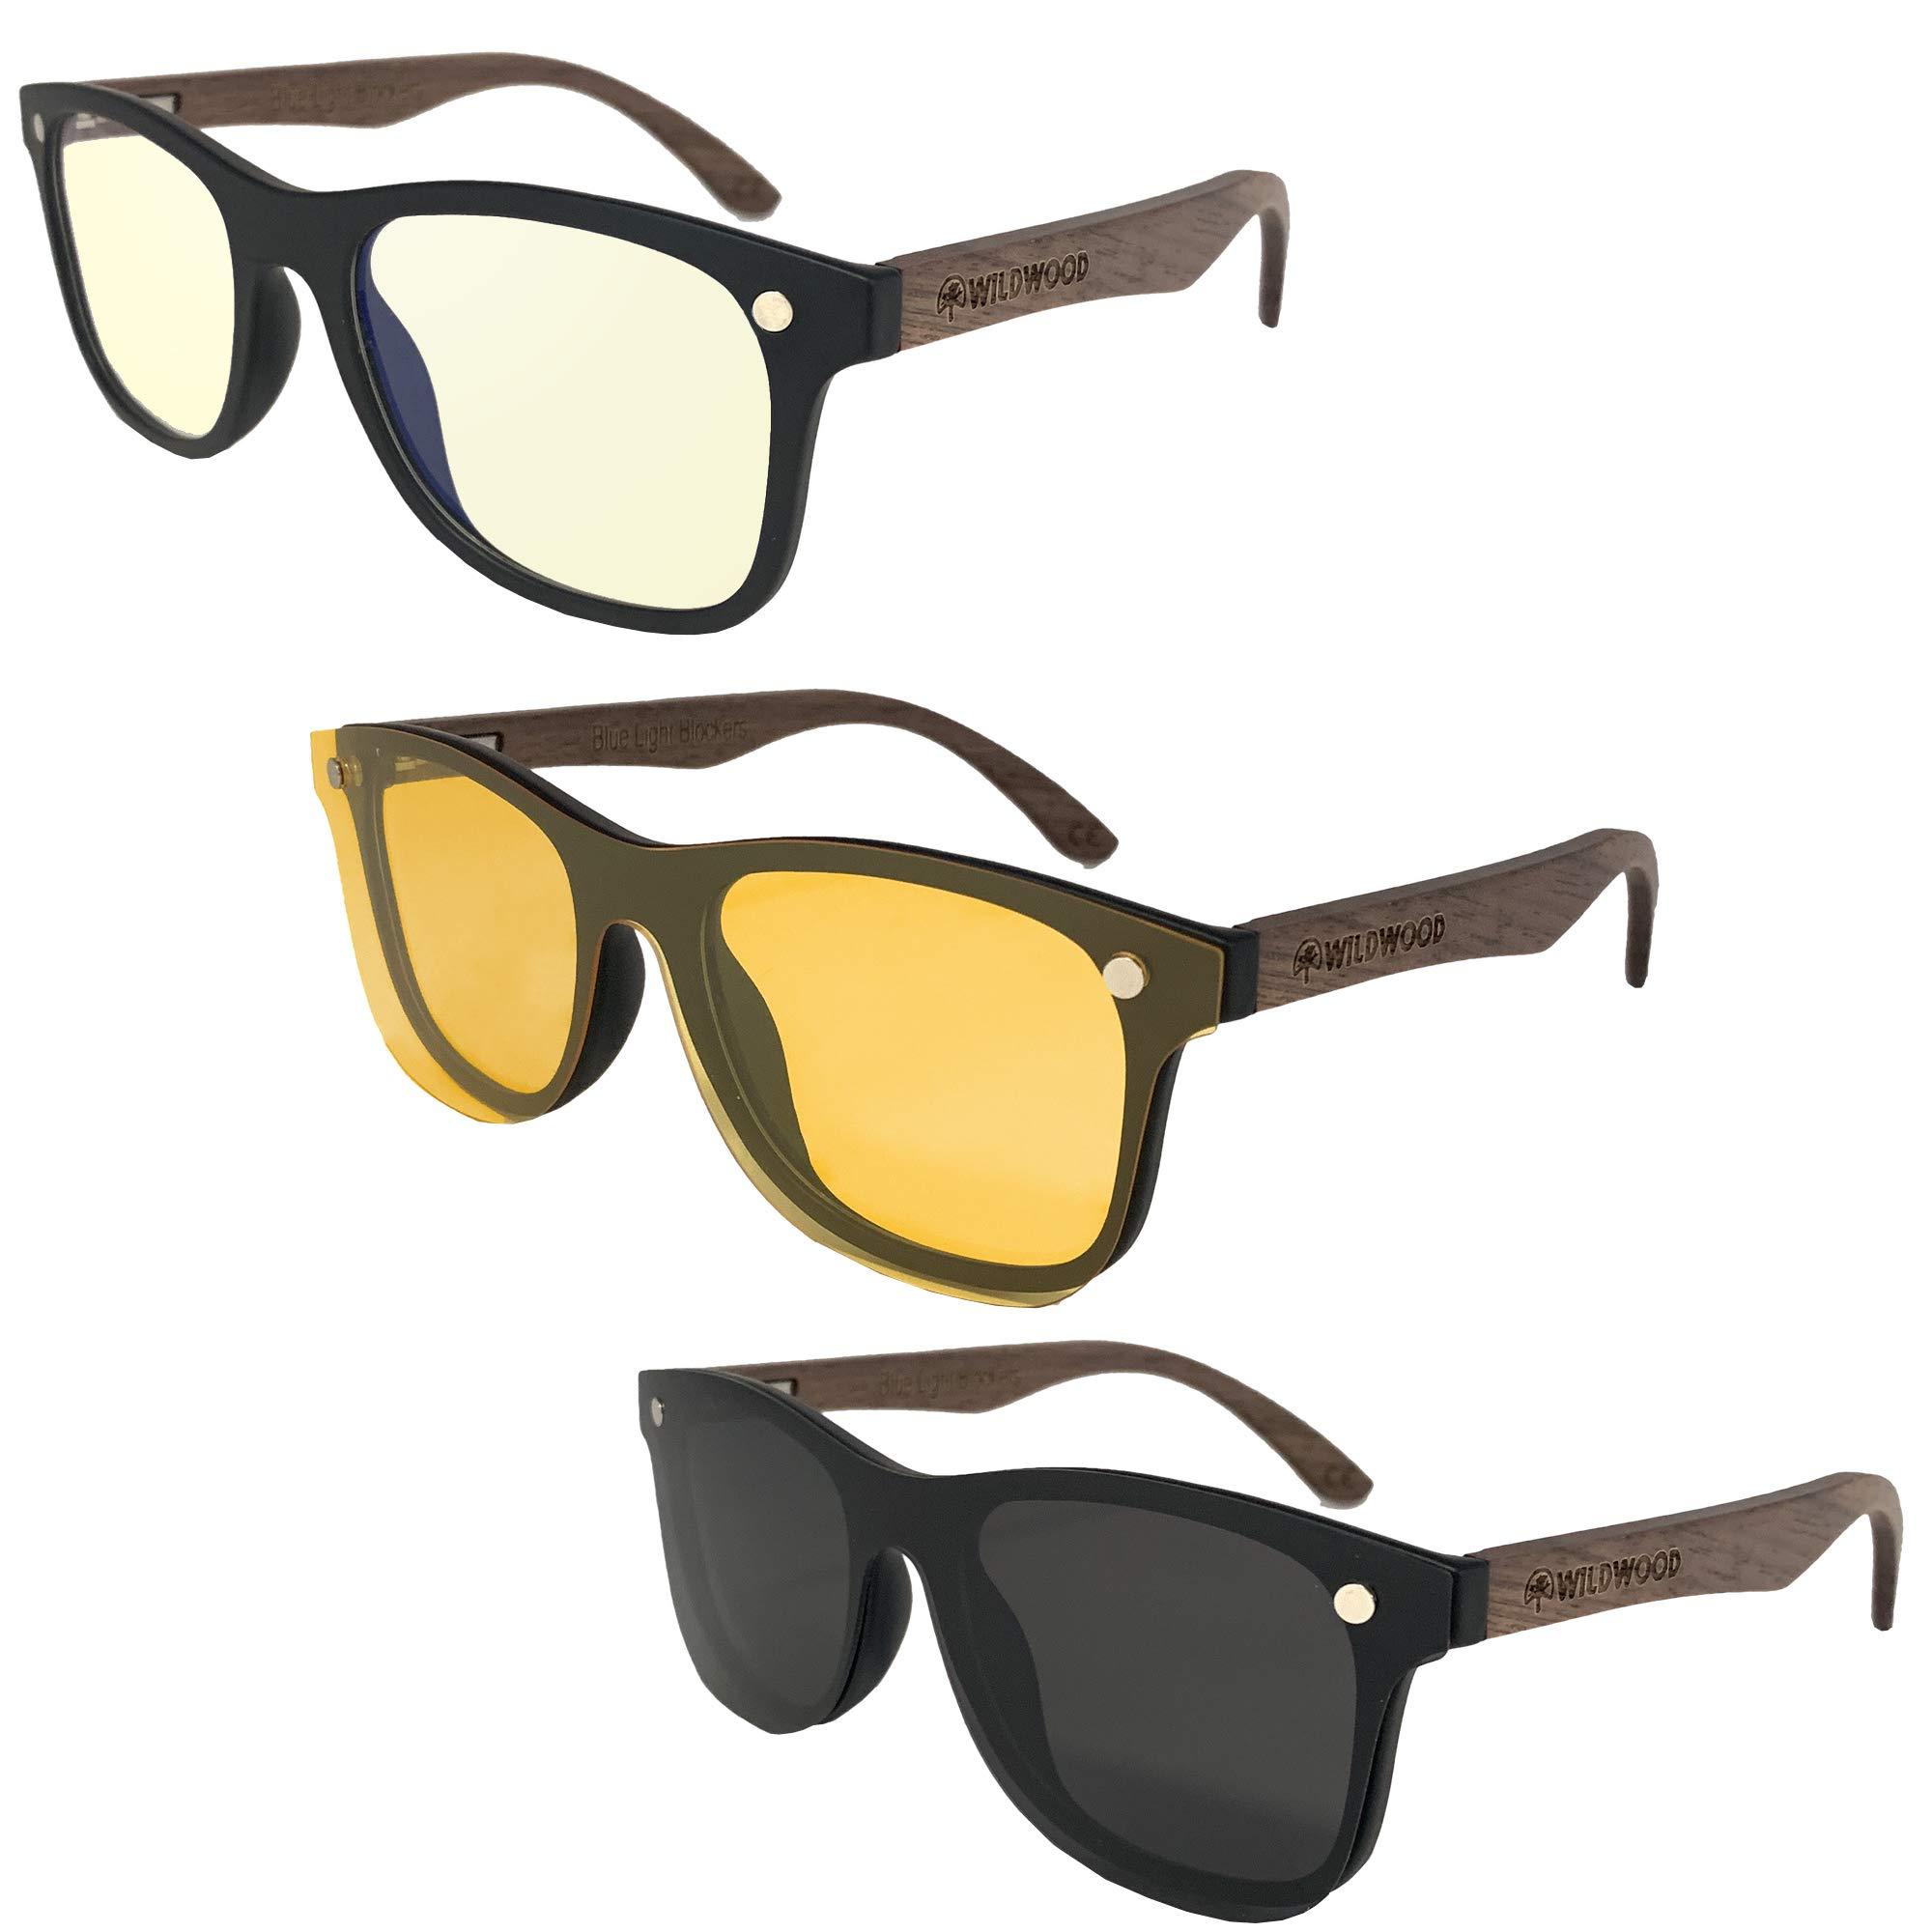 Wildwood Blue Light Blocking Glasses for Day and Night Use Plus Polarized Sunglasses | Anti Eye Strain | Enhanced Sleep Cycle (Walnut Wood Arms)